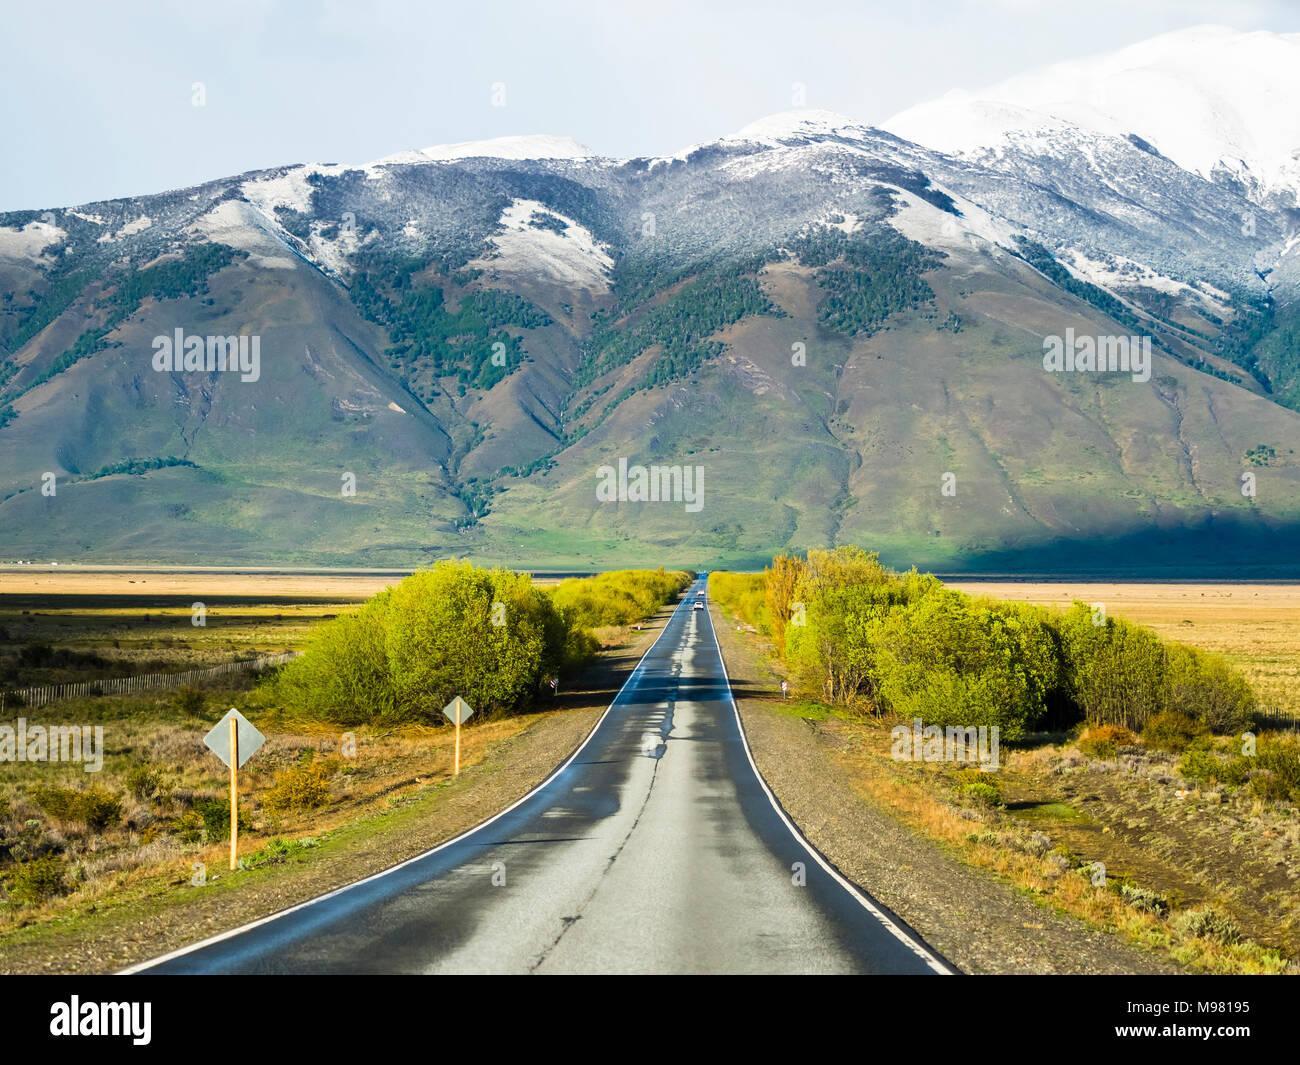 Argentina, Patagonia, El Calafate, Provincia de Santa Cruz, cerca de la carretera Lago-Argentino Imagen De Stock